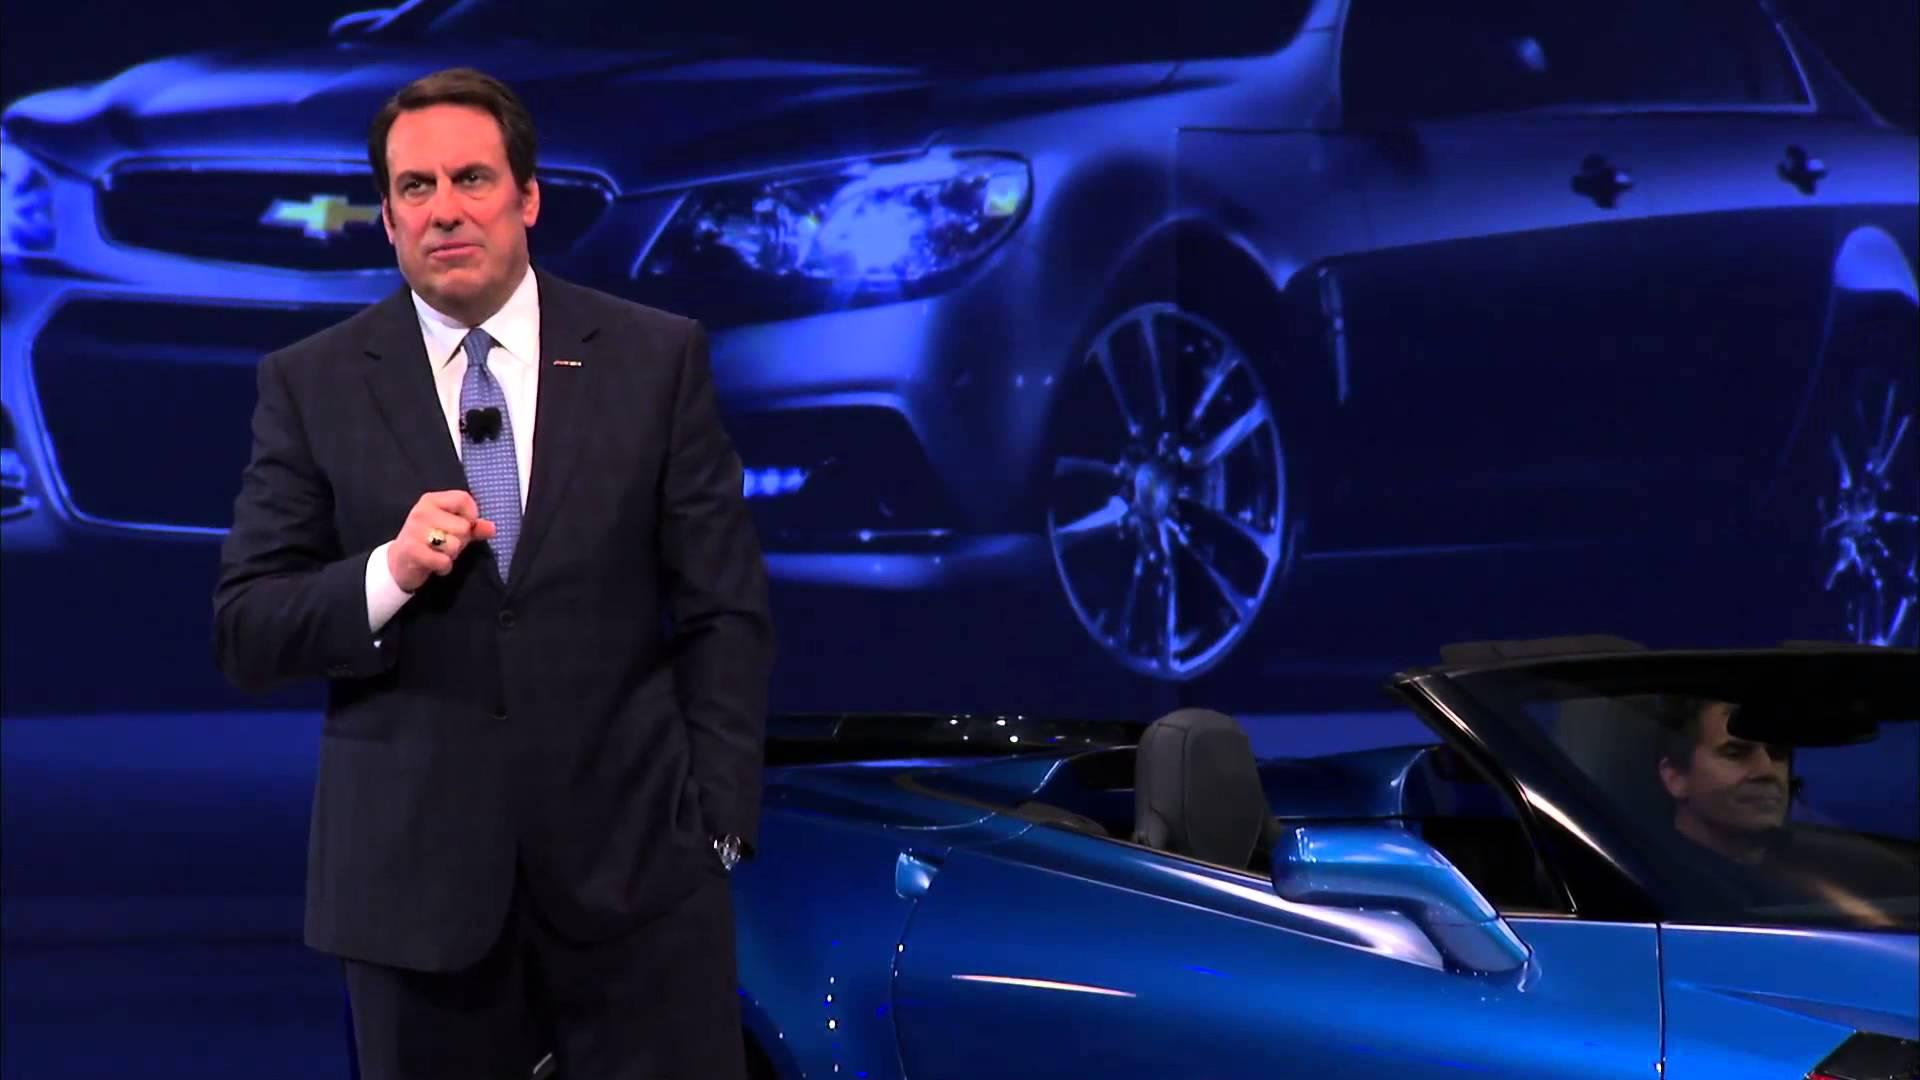 New York International Auto Show 2015 Chevrolet Corvette Z06 Convertible